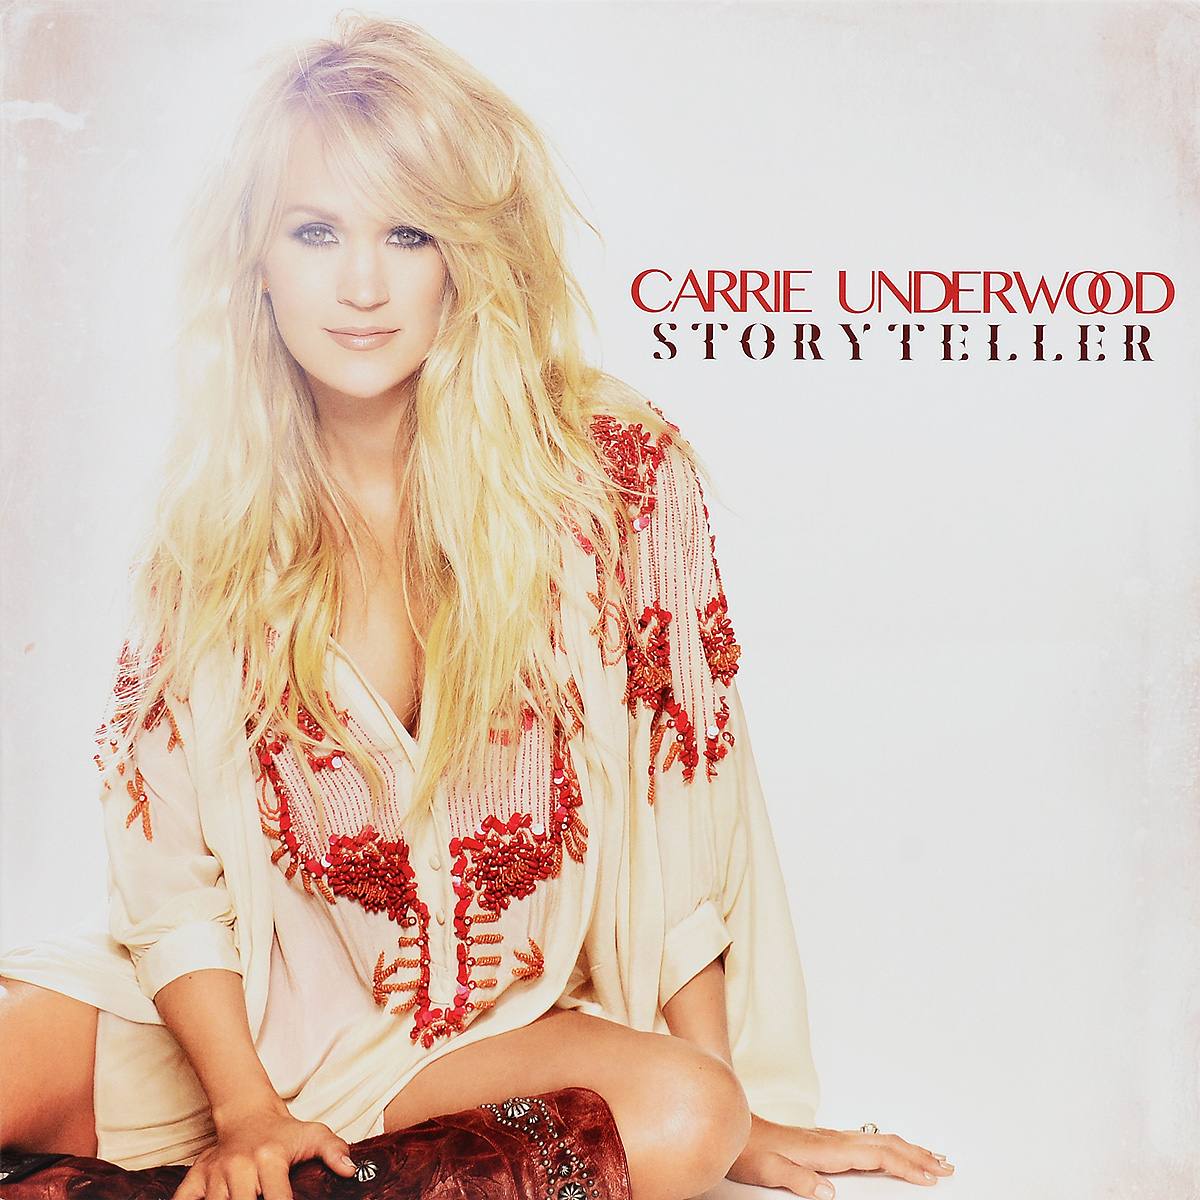 цена  Кэрри Андервуд Carrie Underwood. Storyteller (2 LP)  онлайн в 2017 году